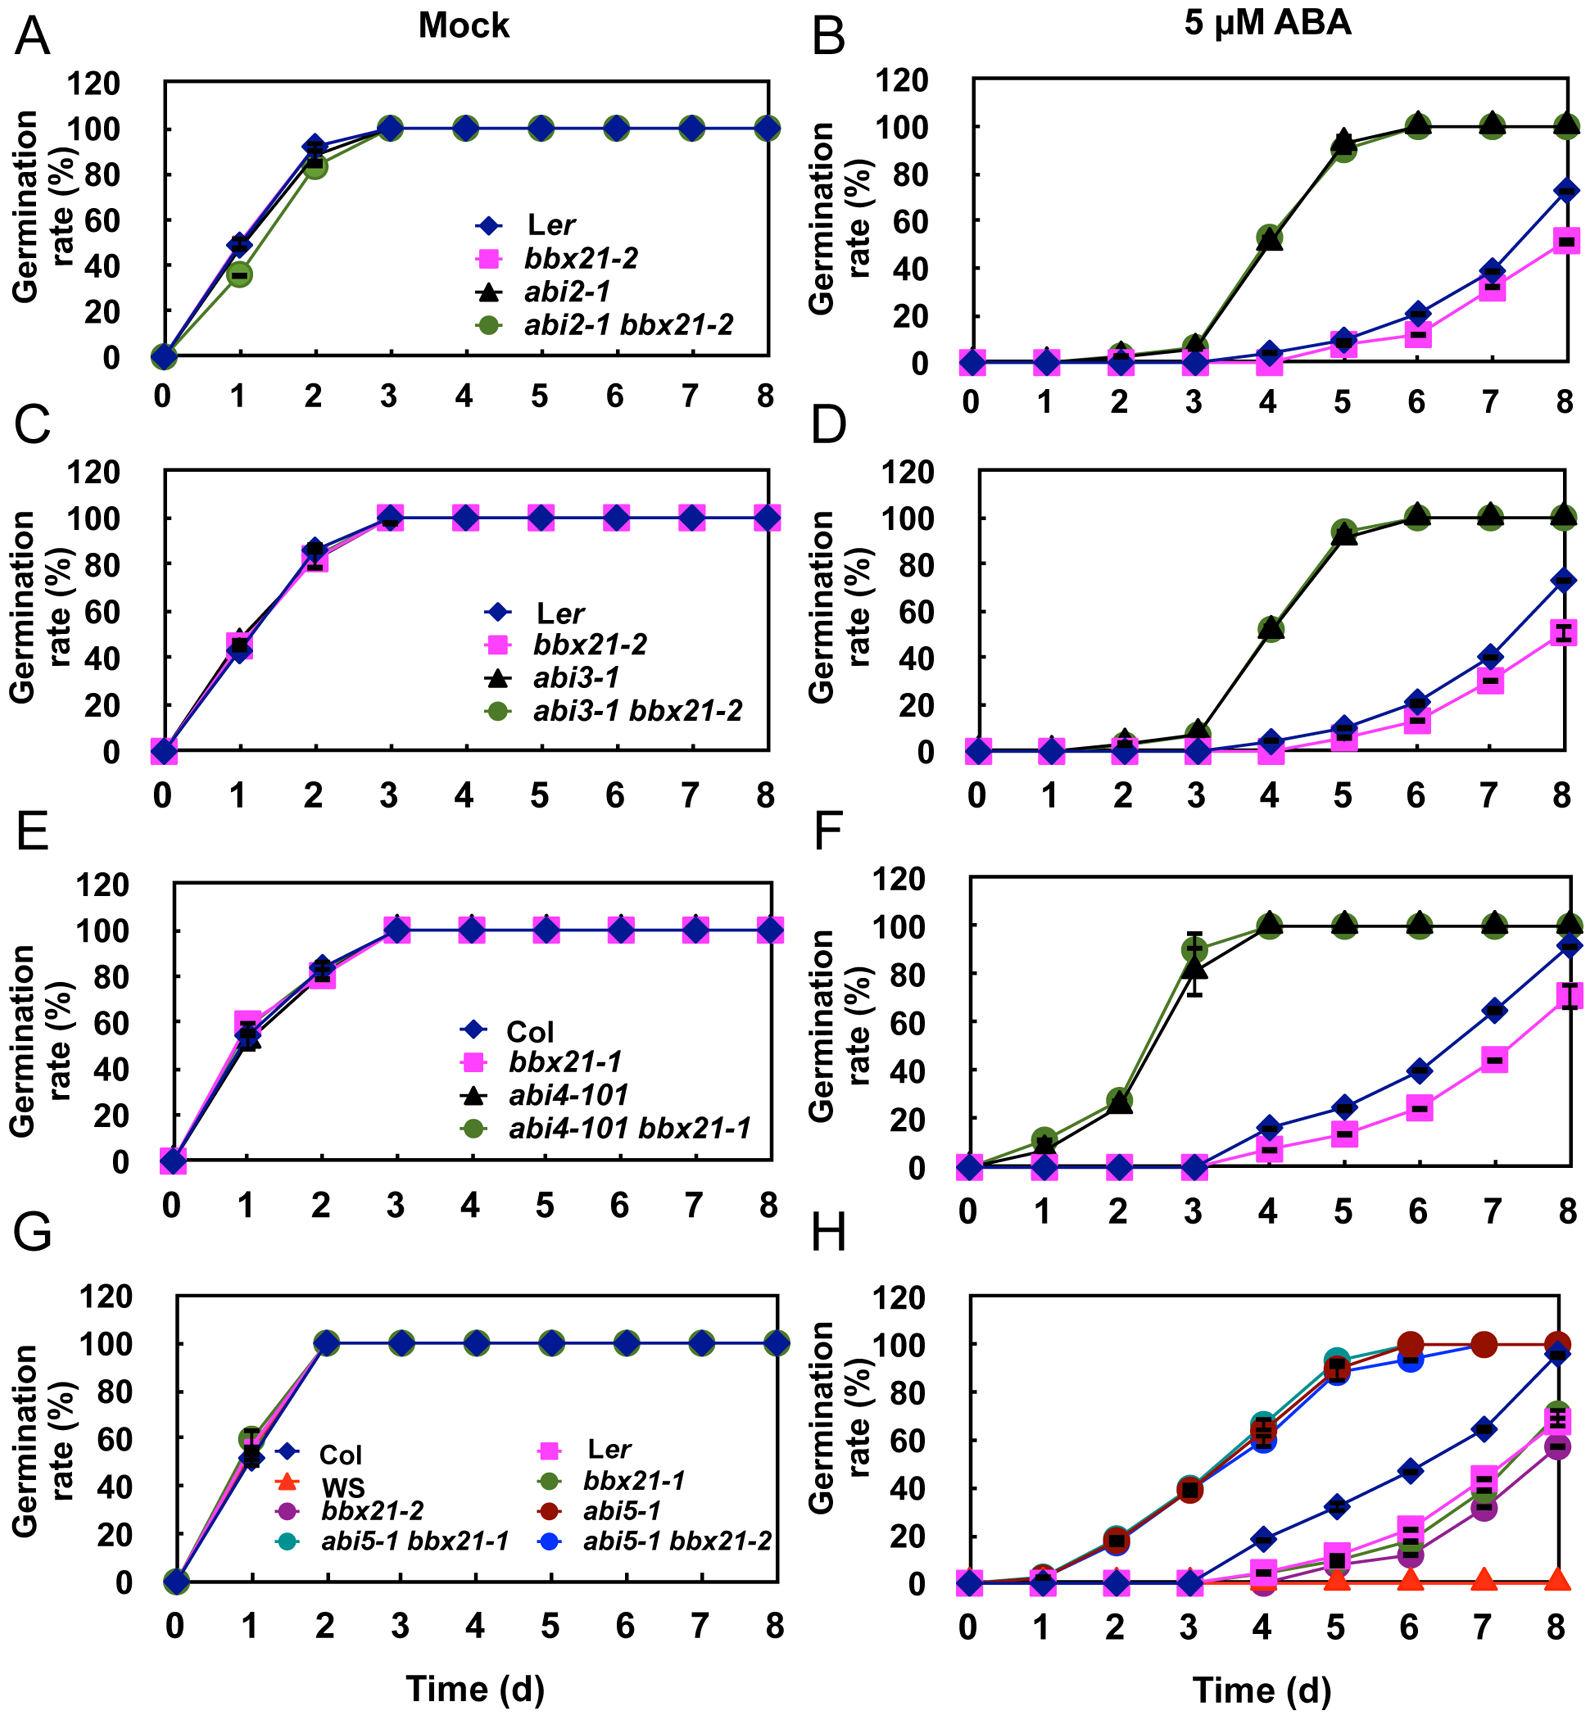 Germination rates of <i>bbx21, ab</i>i and <i>abi bbx21</i> mutants.